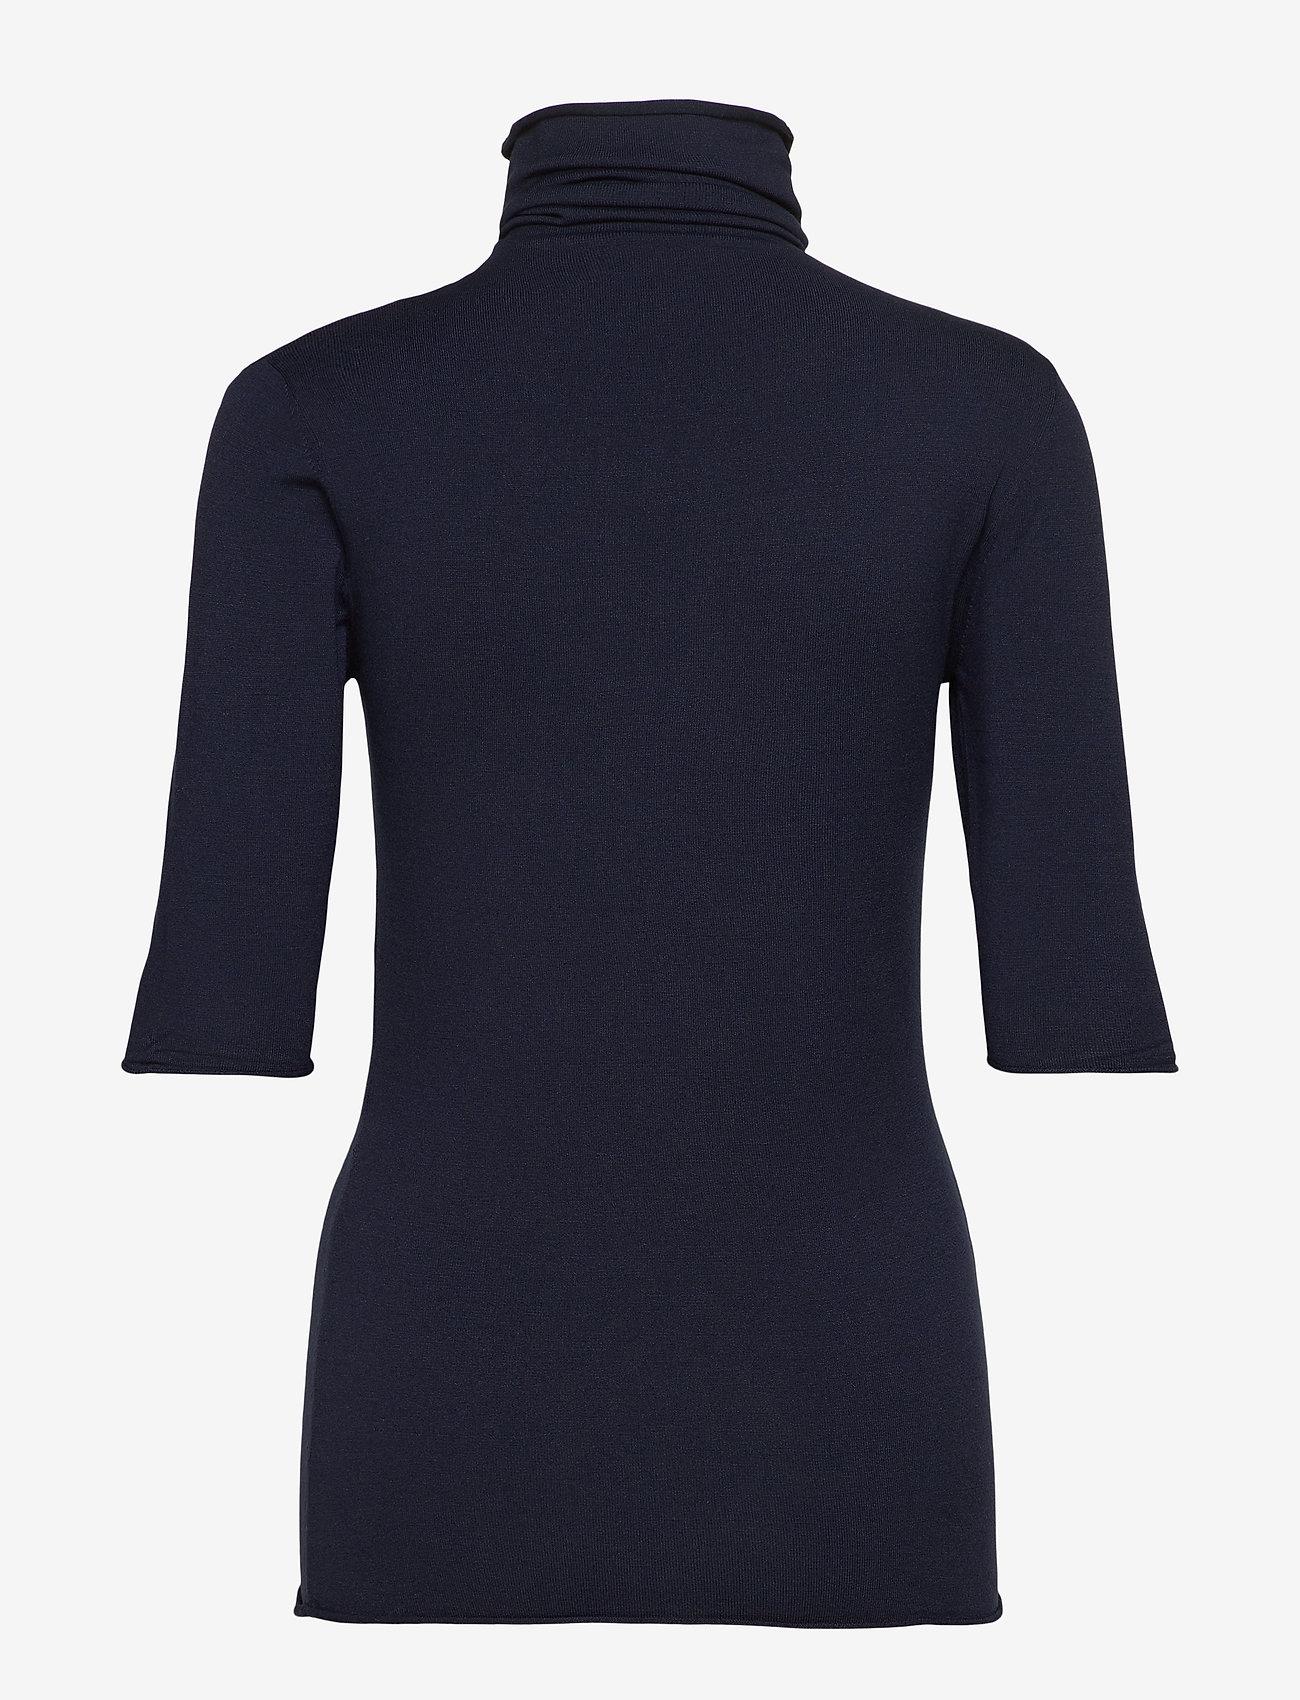 Max&Co. - DADO - gebreide t-shirts - navy blue - 1